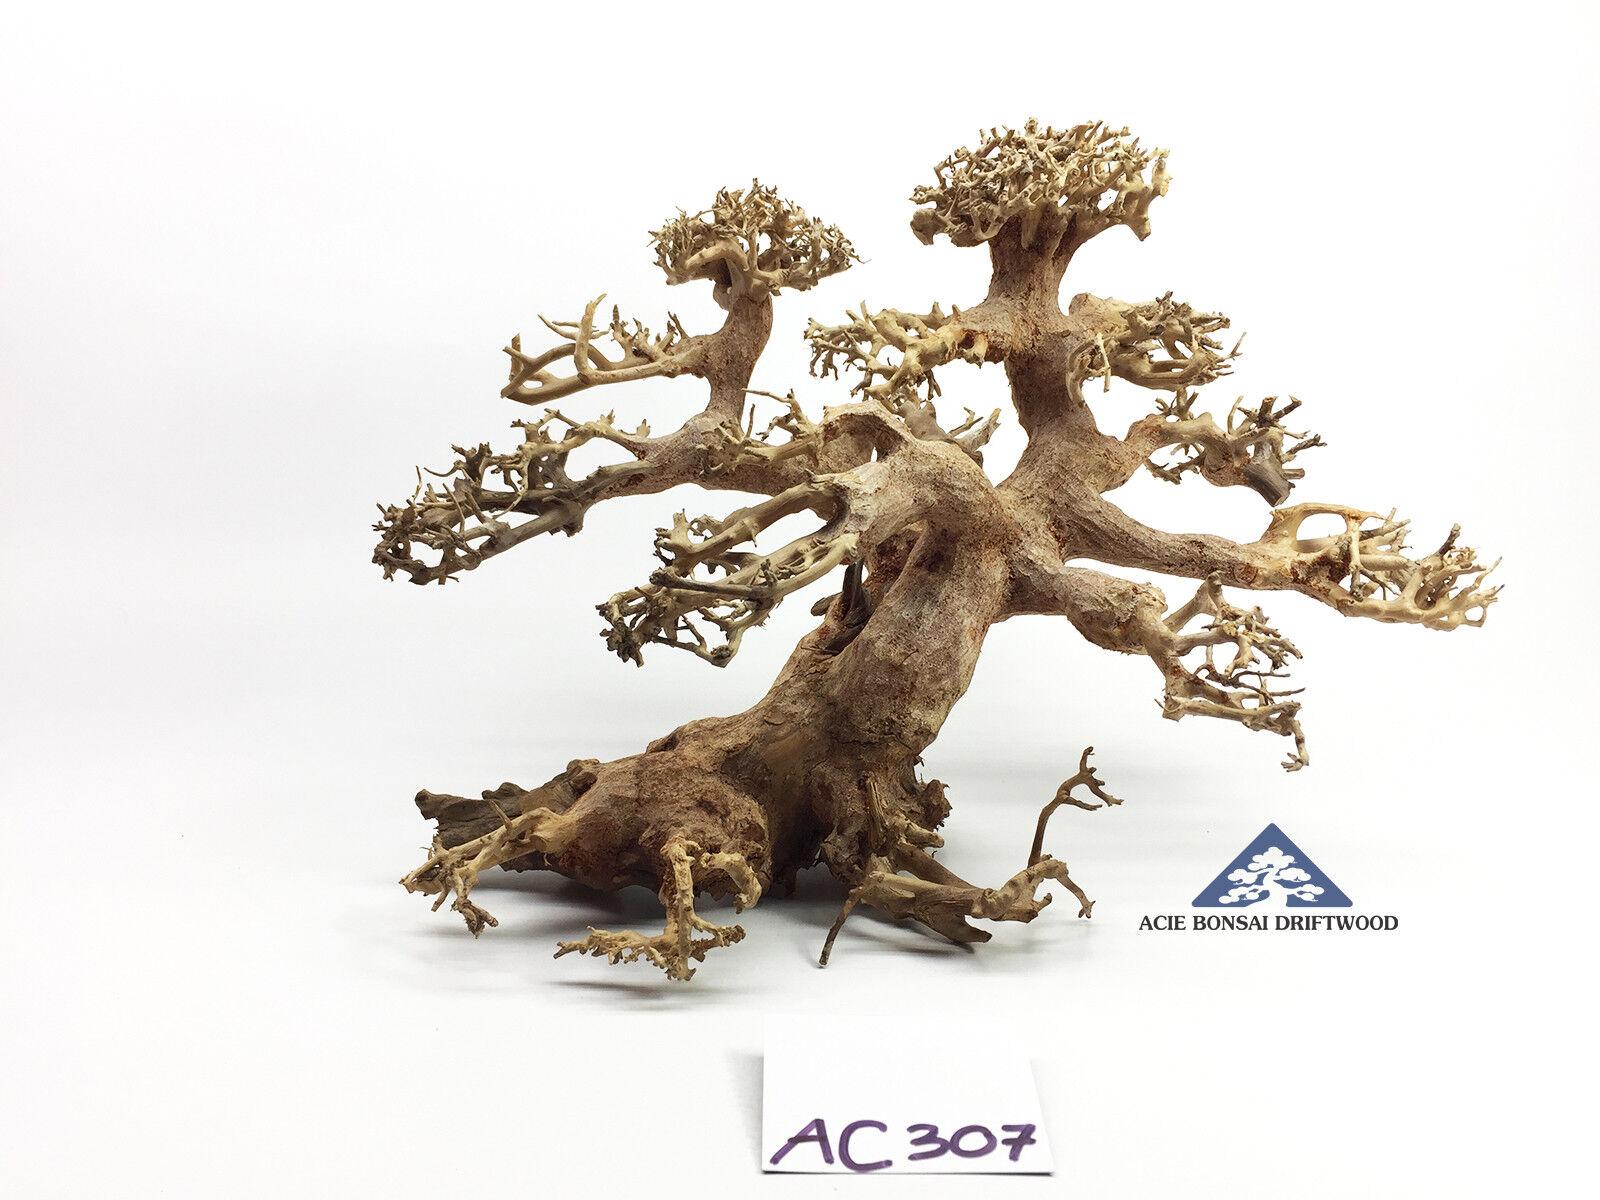 Bonsai Driftwood Tree for Aquarium Moss Fish Shrimp Planted Tank -Size M- AC307